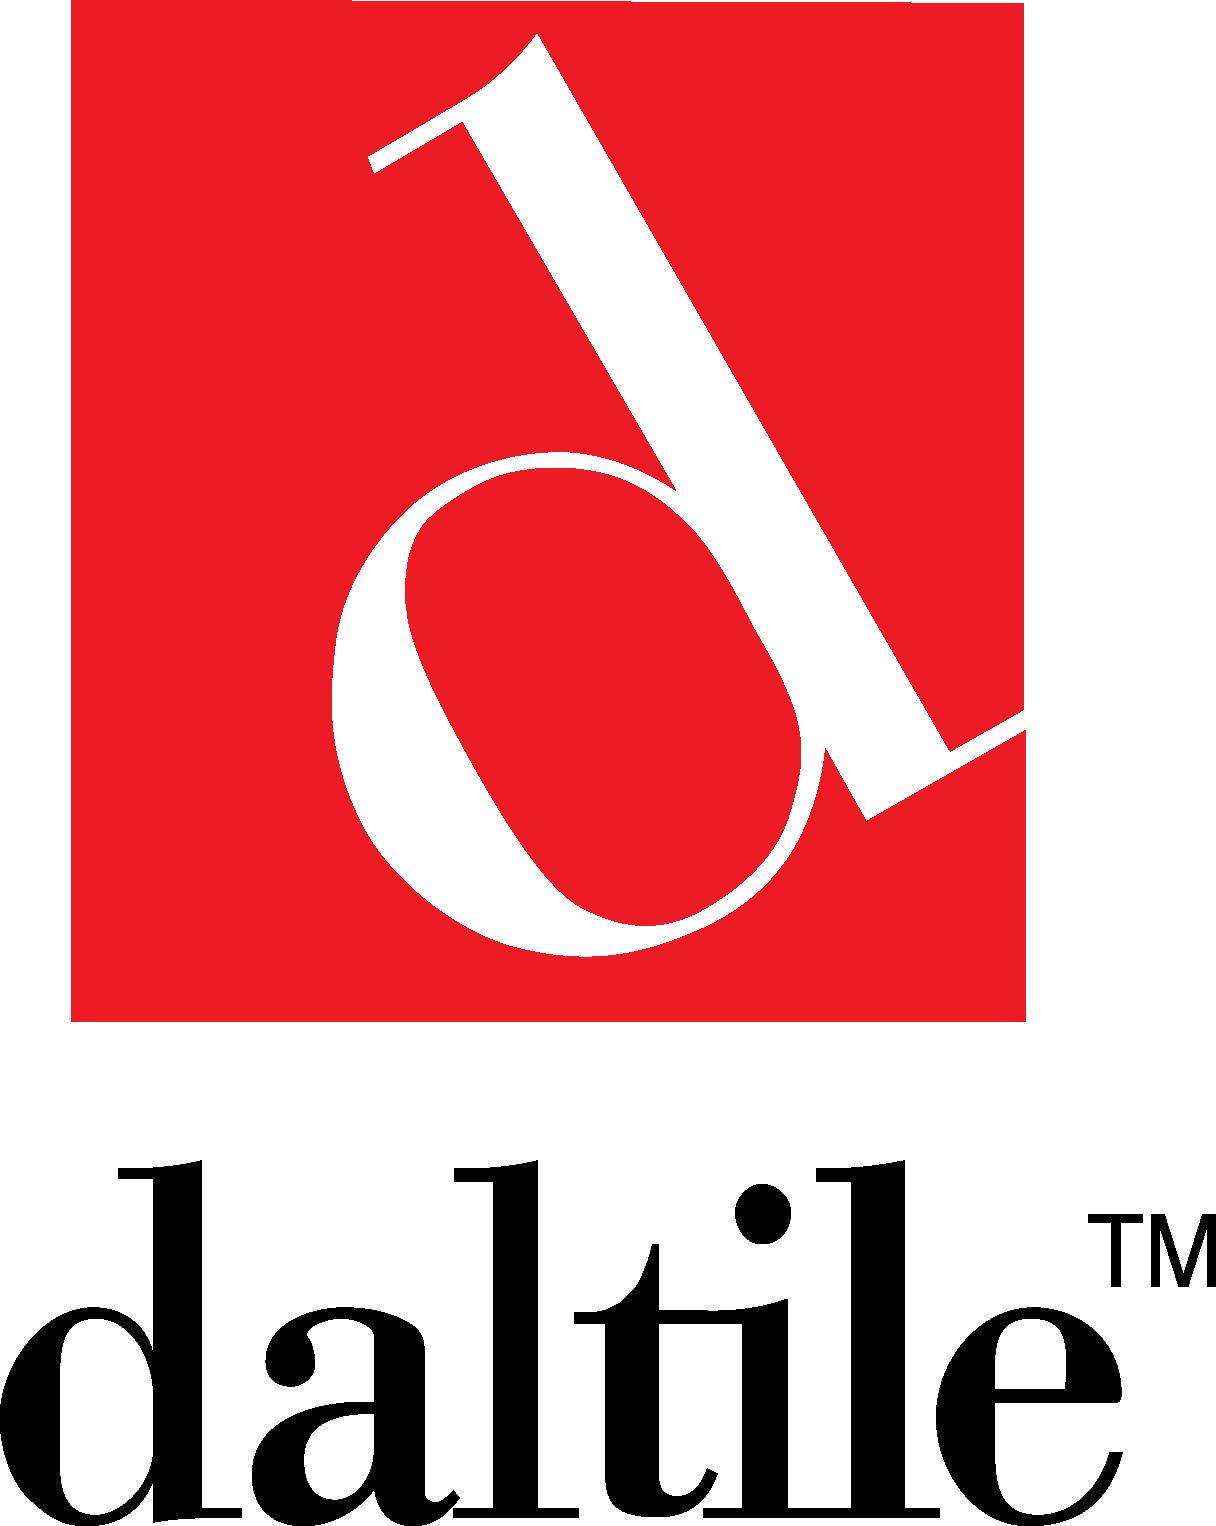 Daltile_cmyk.png